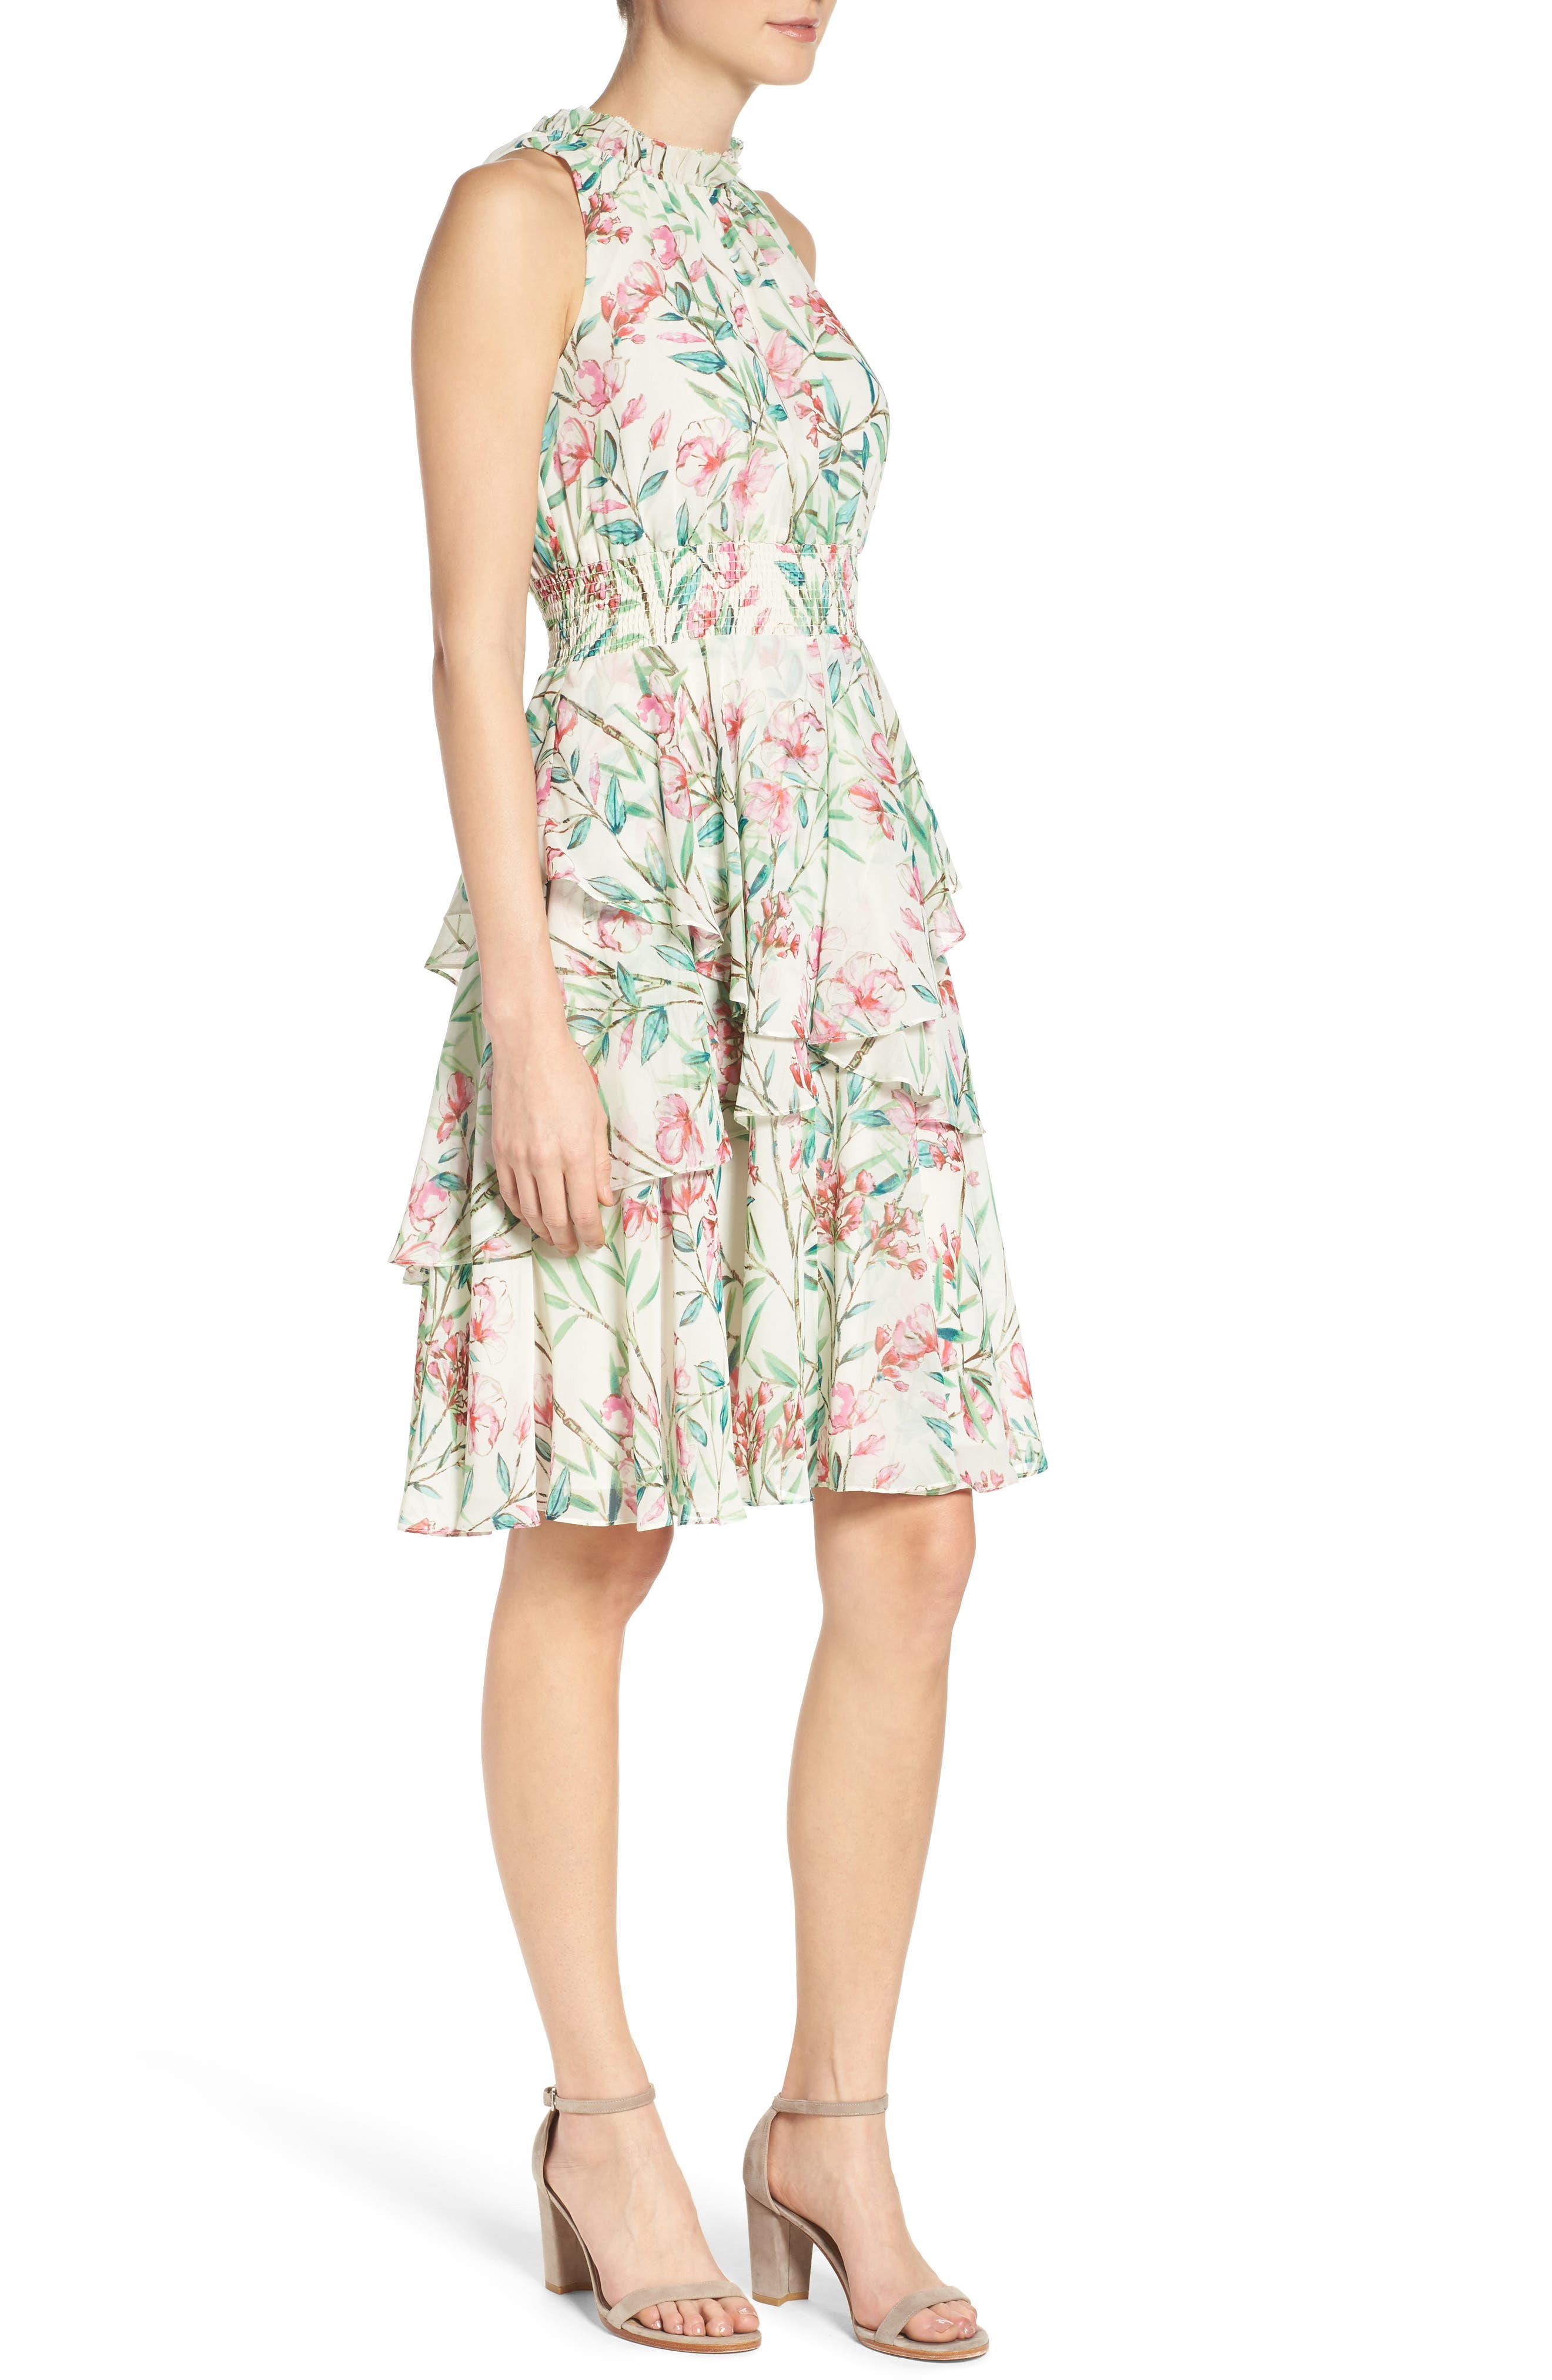 ELIZA J, Chiffon Fit & Flare Dress, Alternate thumbnail 3, color, 901